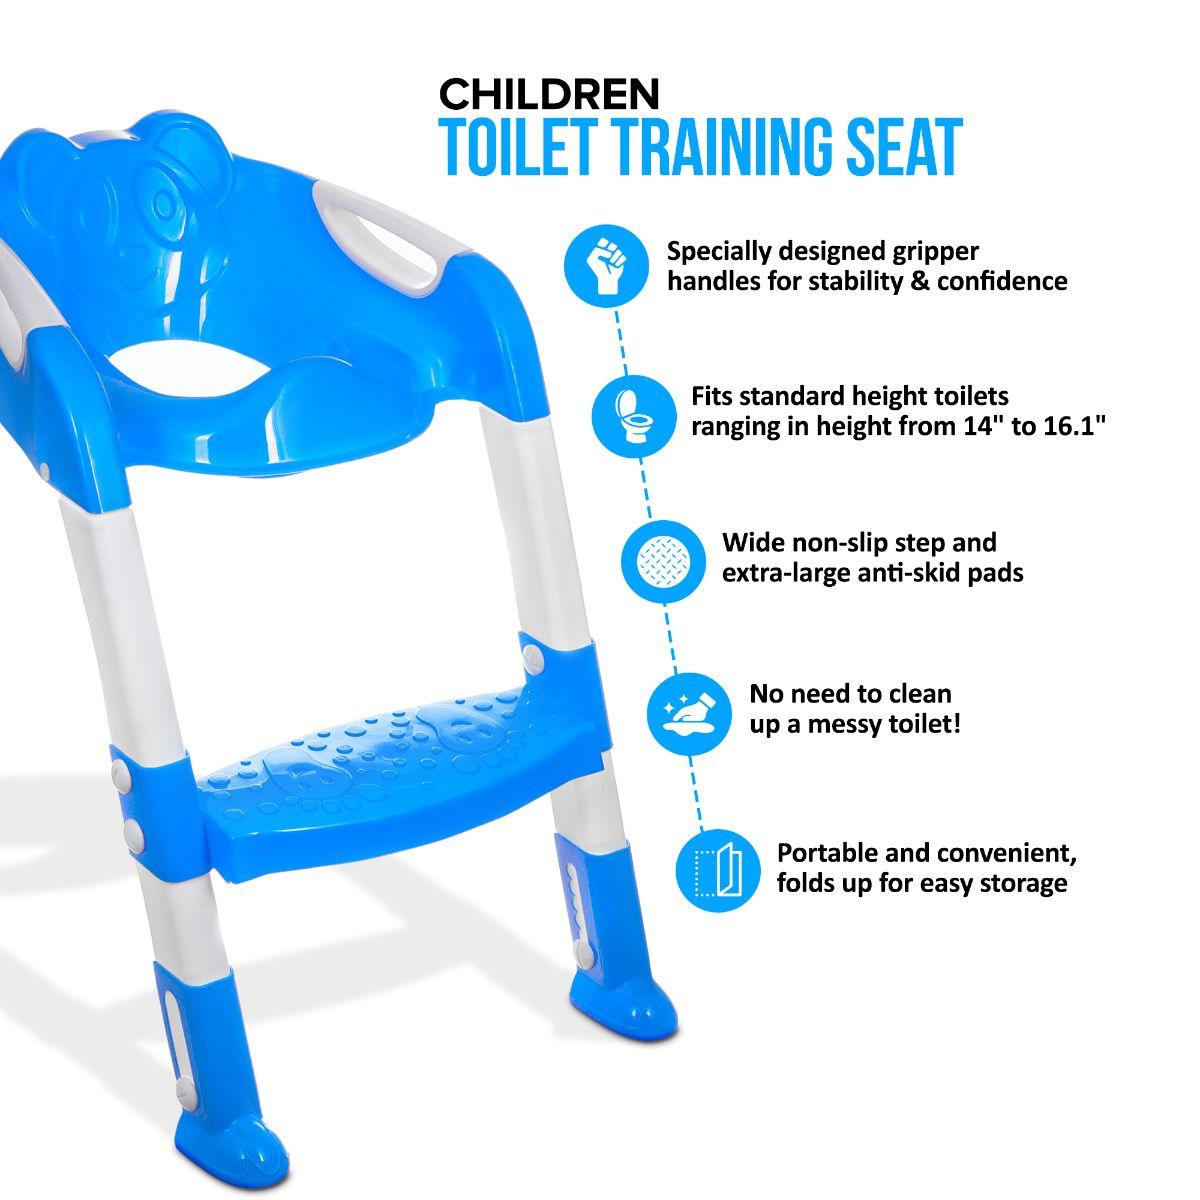 TEDDIE KIDS BABY CHILD TODDLER POTTY LOO TRAINING TOILET SEAT STEP LADDER SAFETY